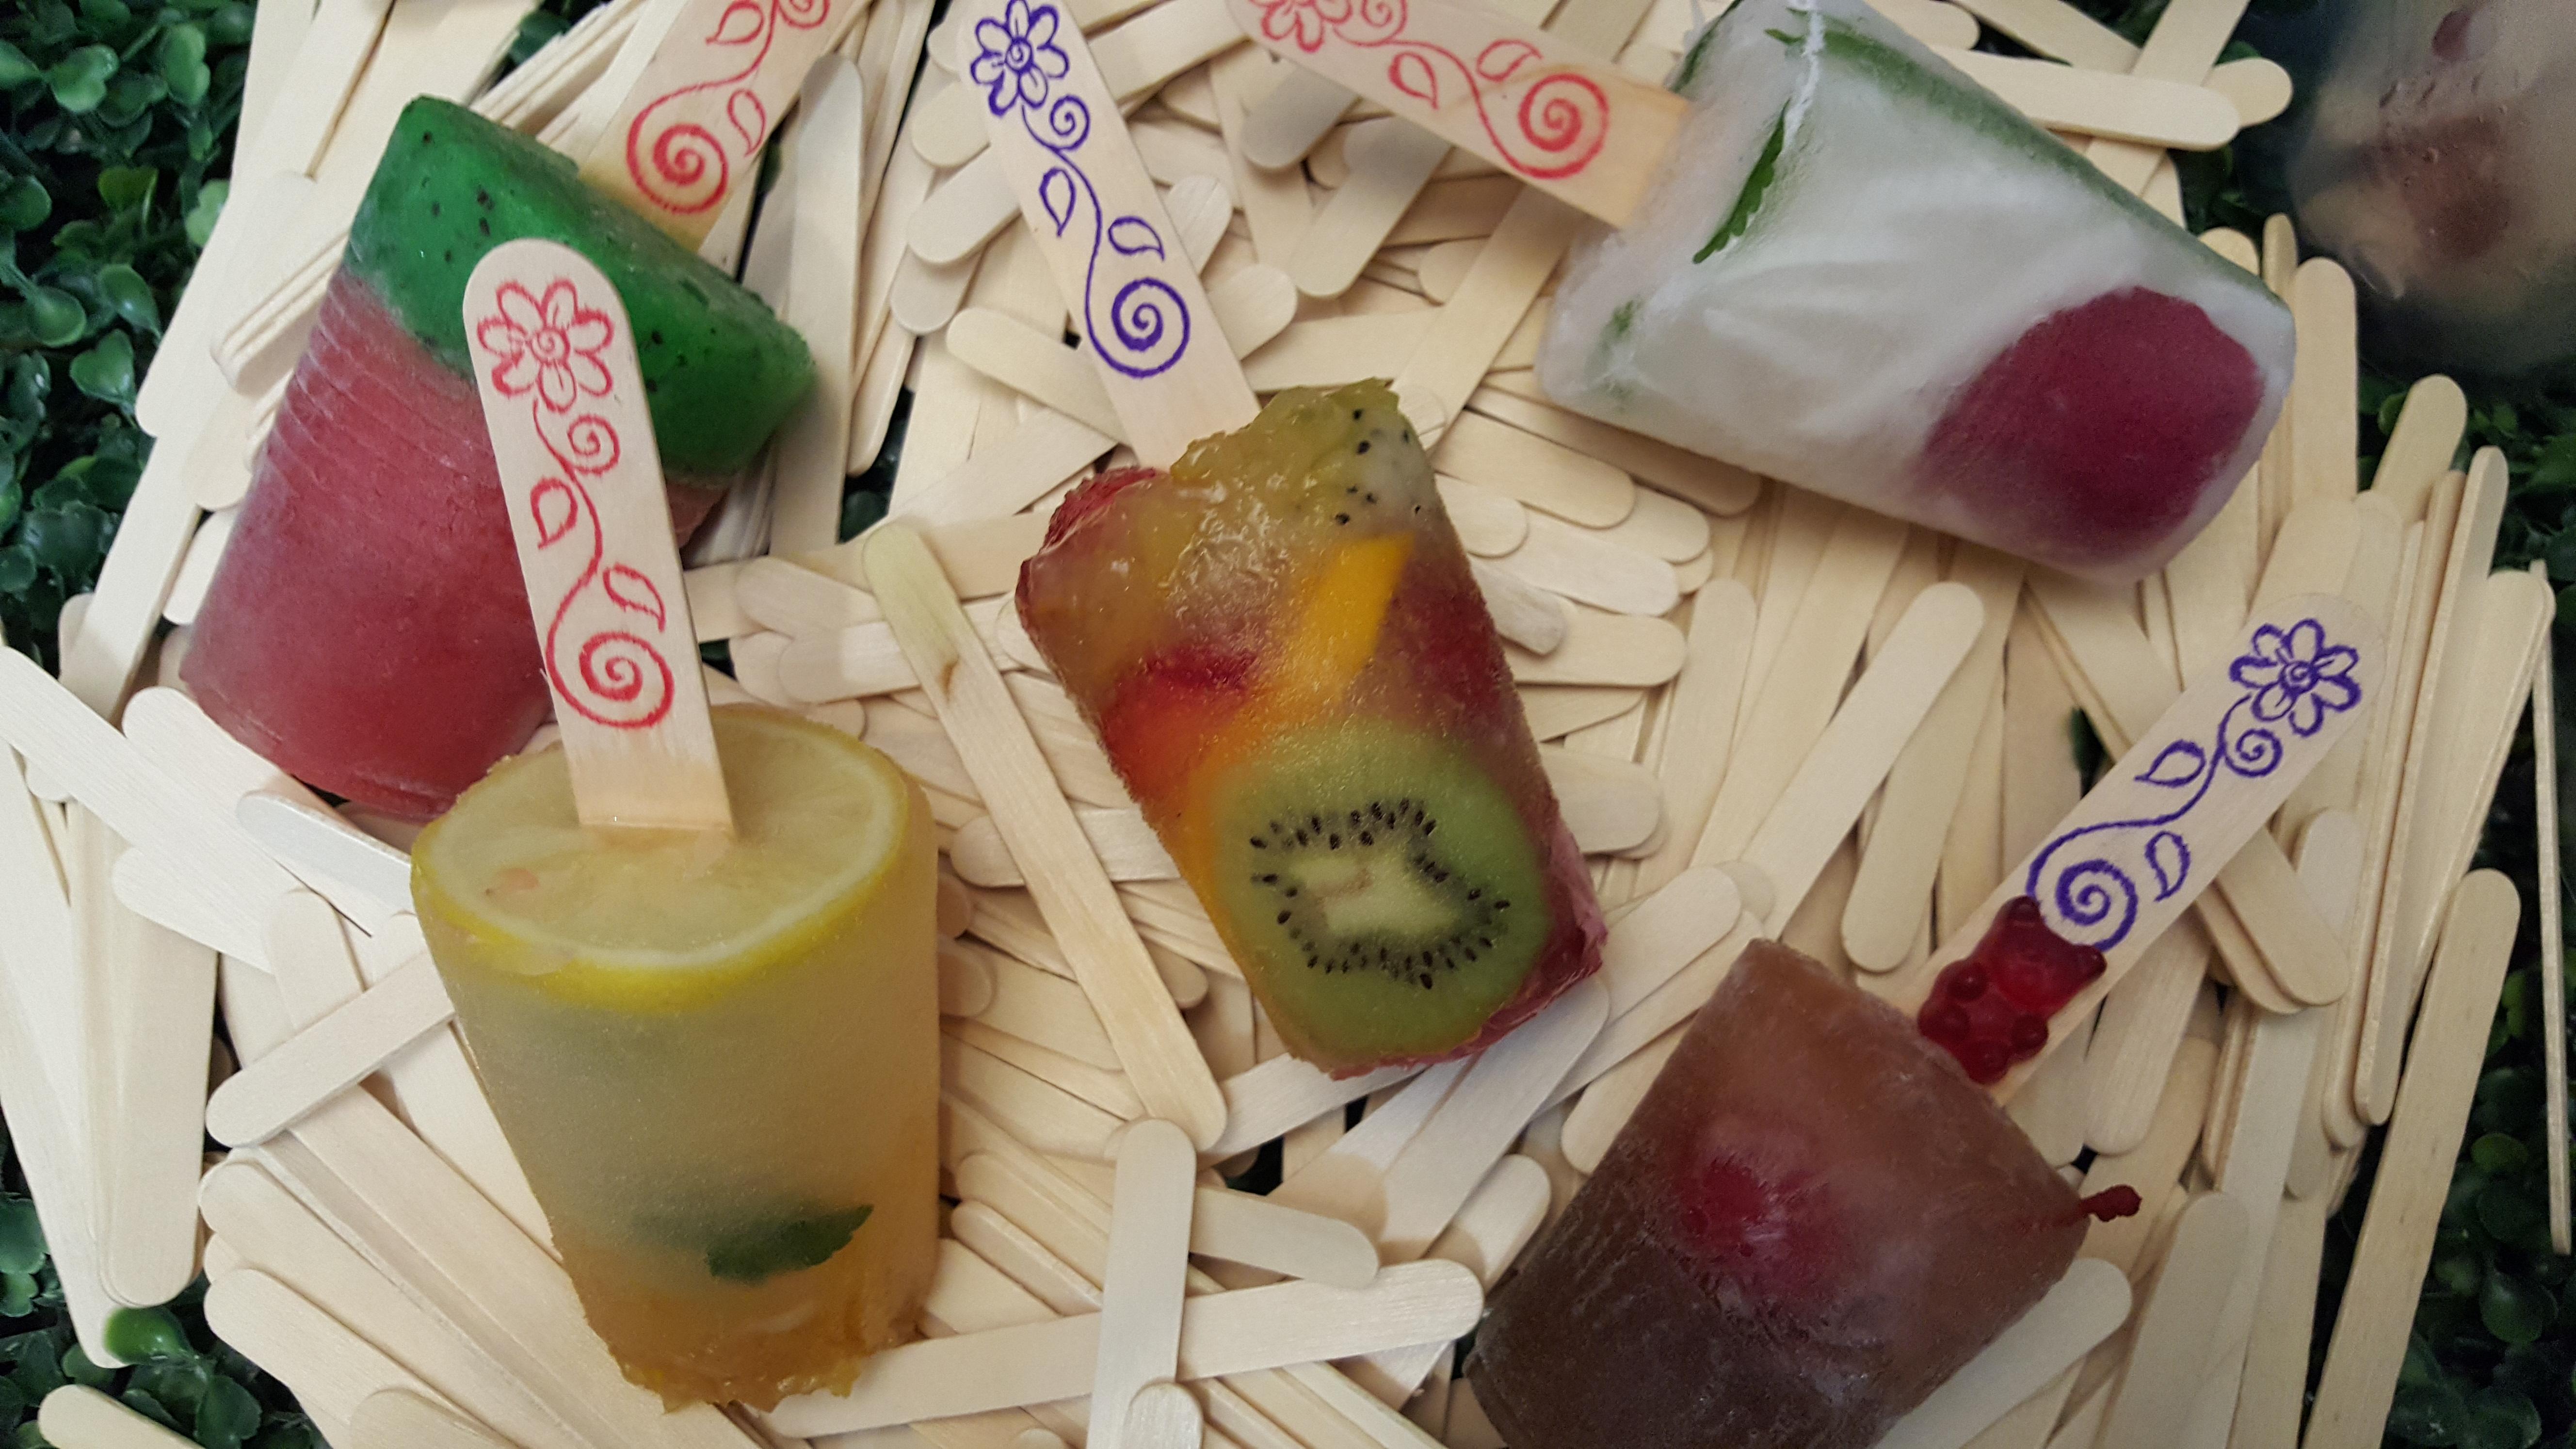 lilboo-popsicles